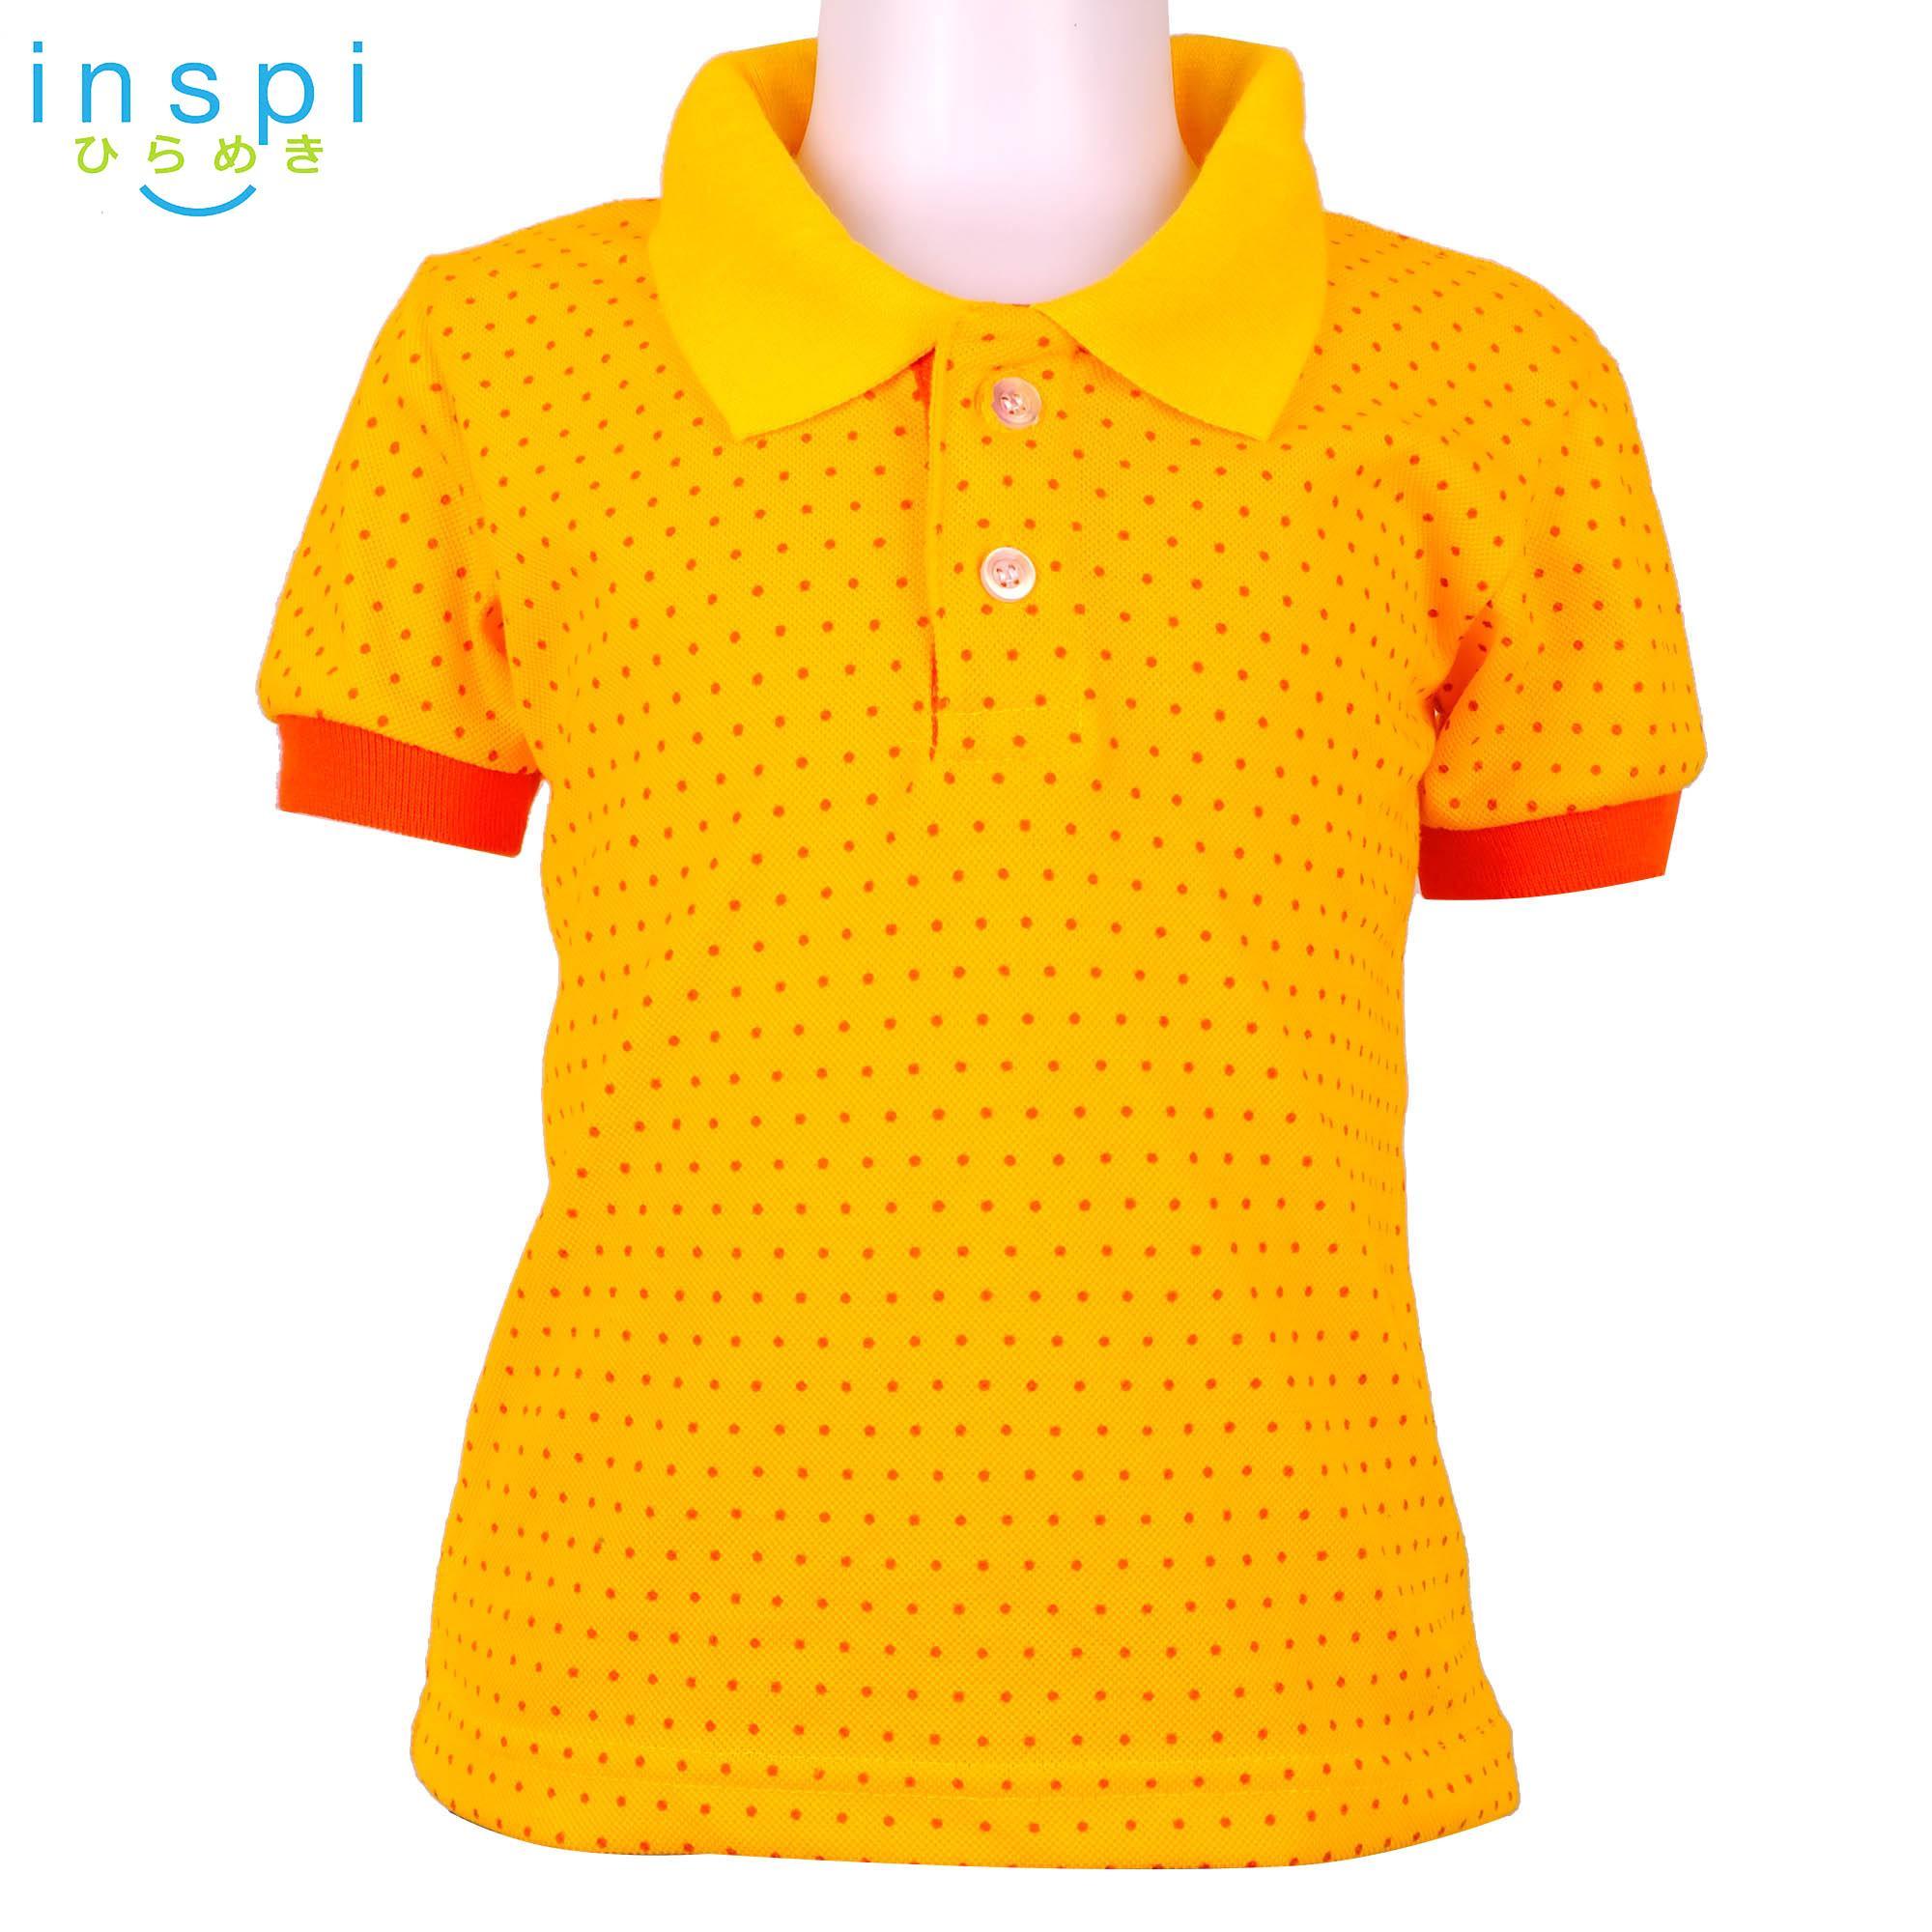 Craftshirt Online Tshirt Design Software Chad Crowley Productions